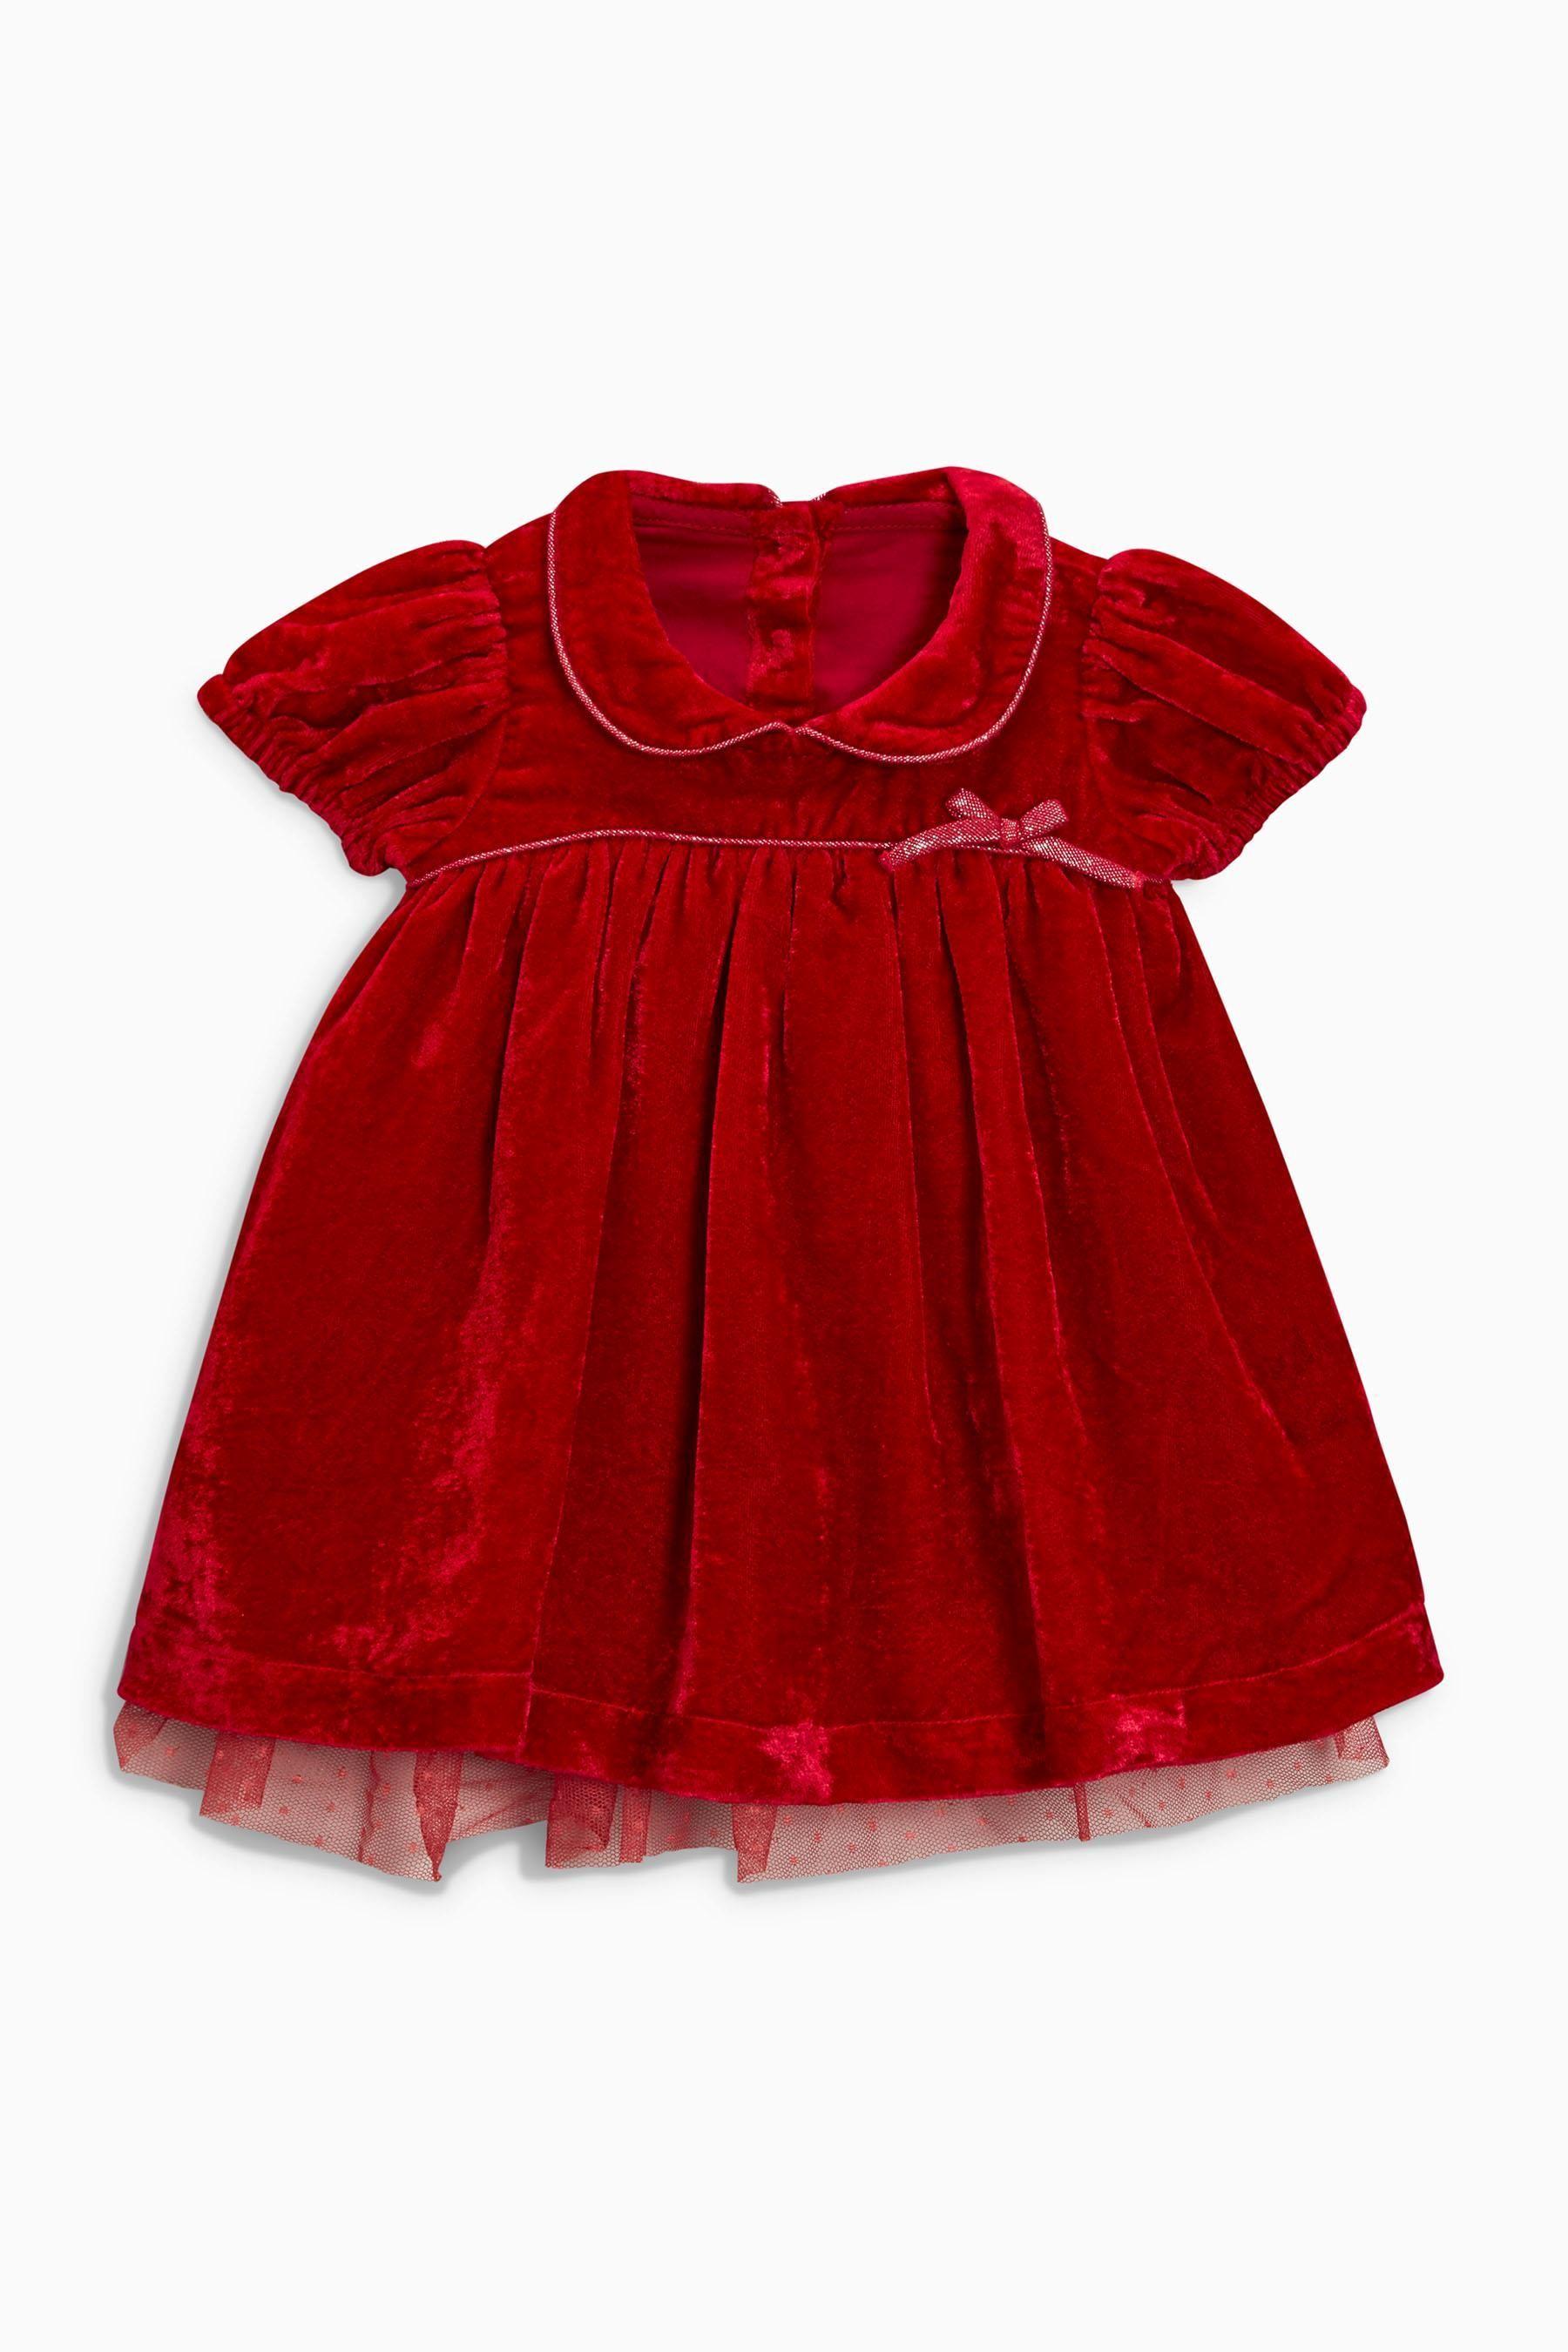 9f80084302fd9 Buy Red Velvet Dress (0mths-2yrs) from the Next UK online shop ...